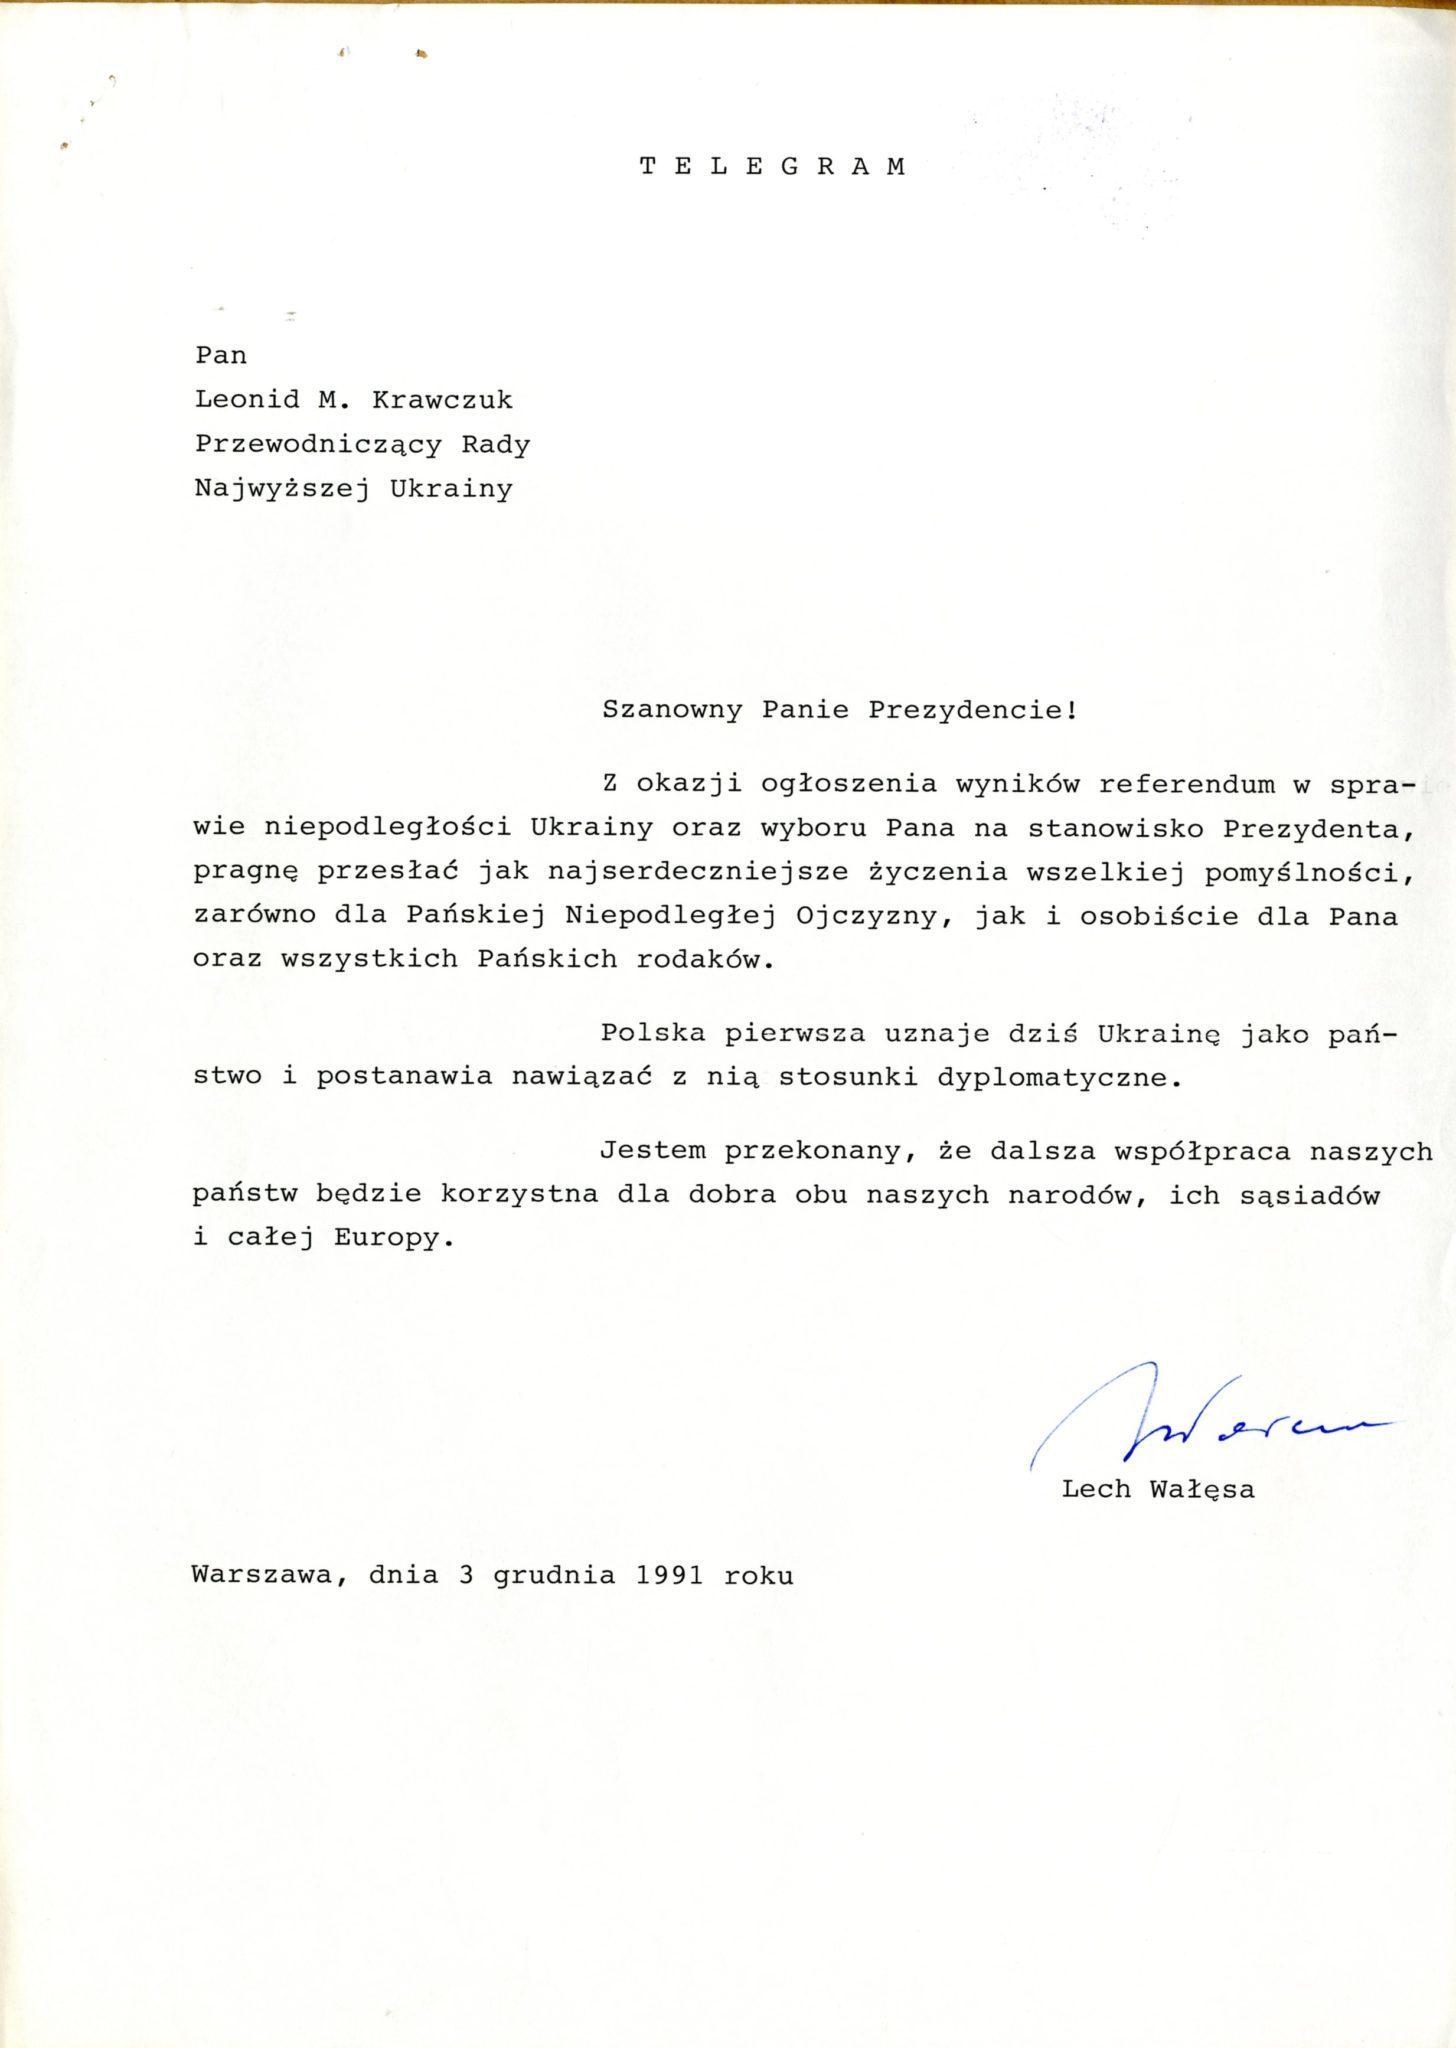 stosunki-22_1991-12-03-walesa